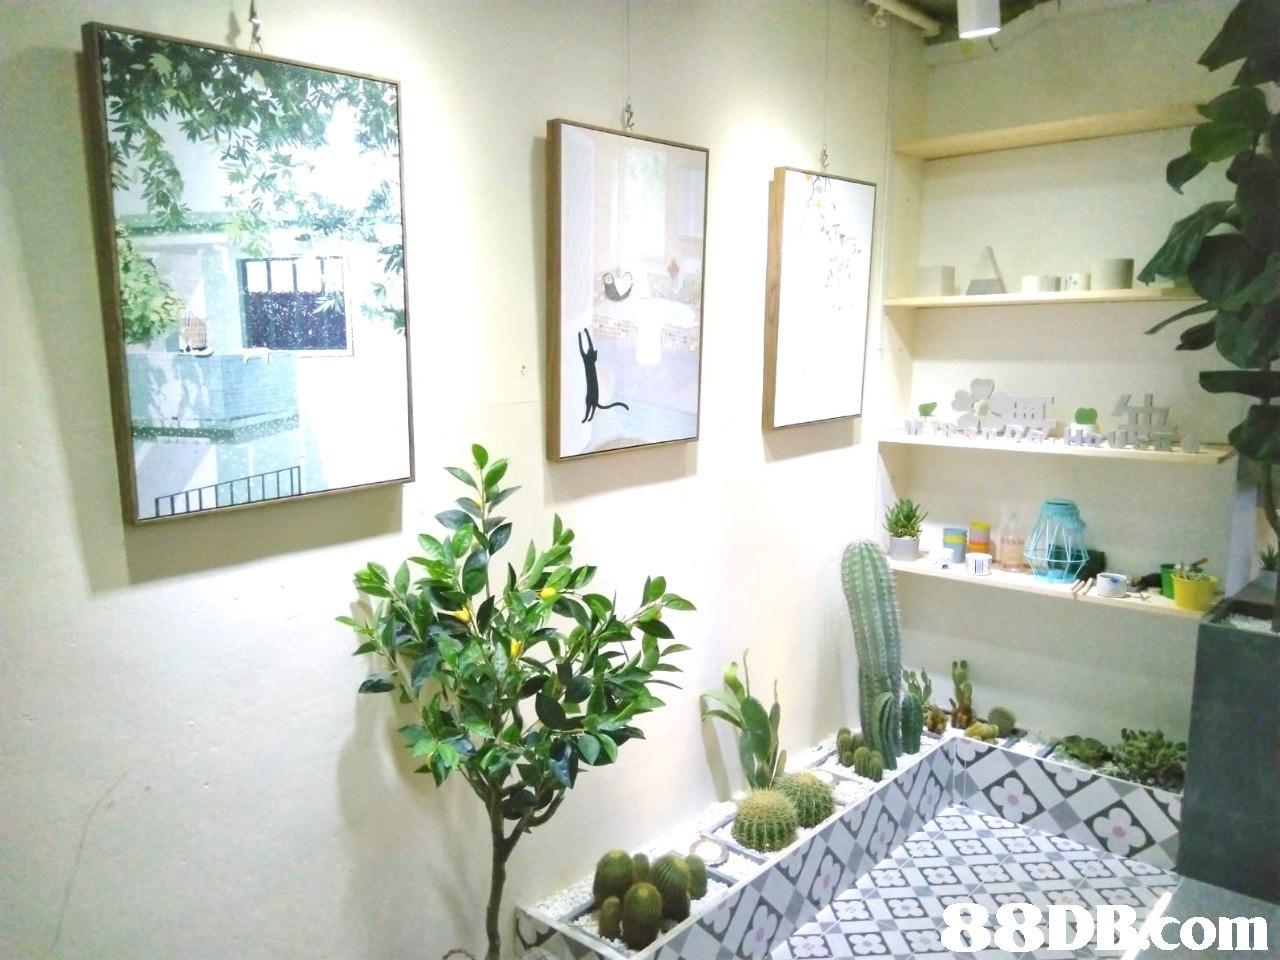 DB com  property,home,plant,flower,real estate